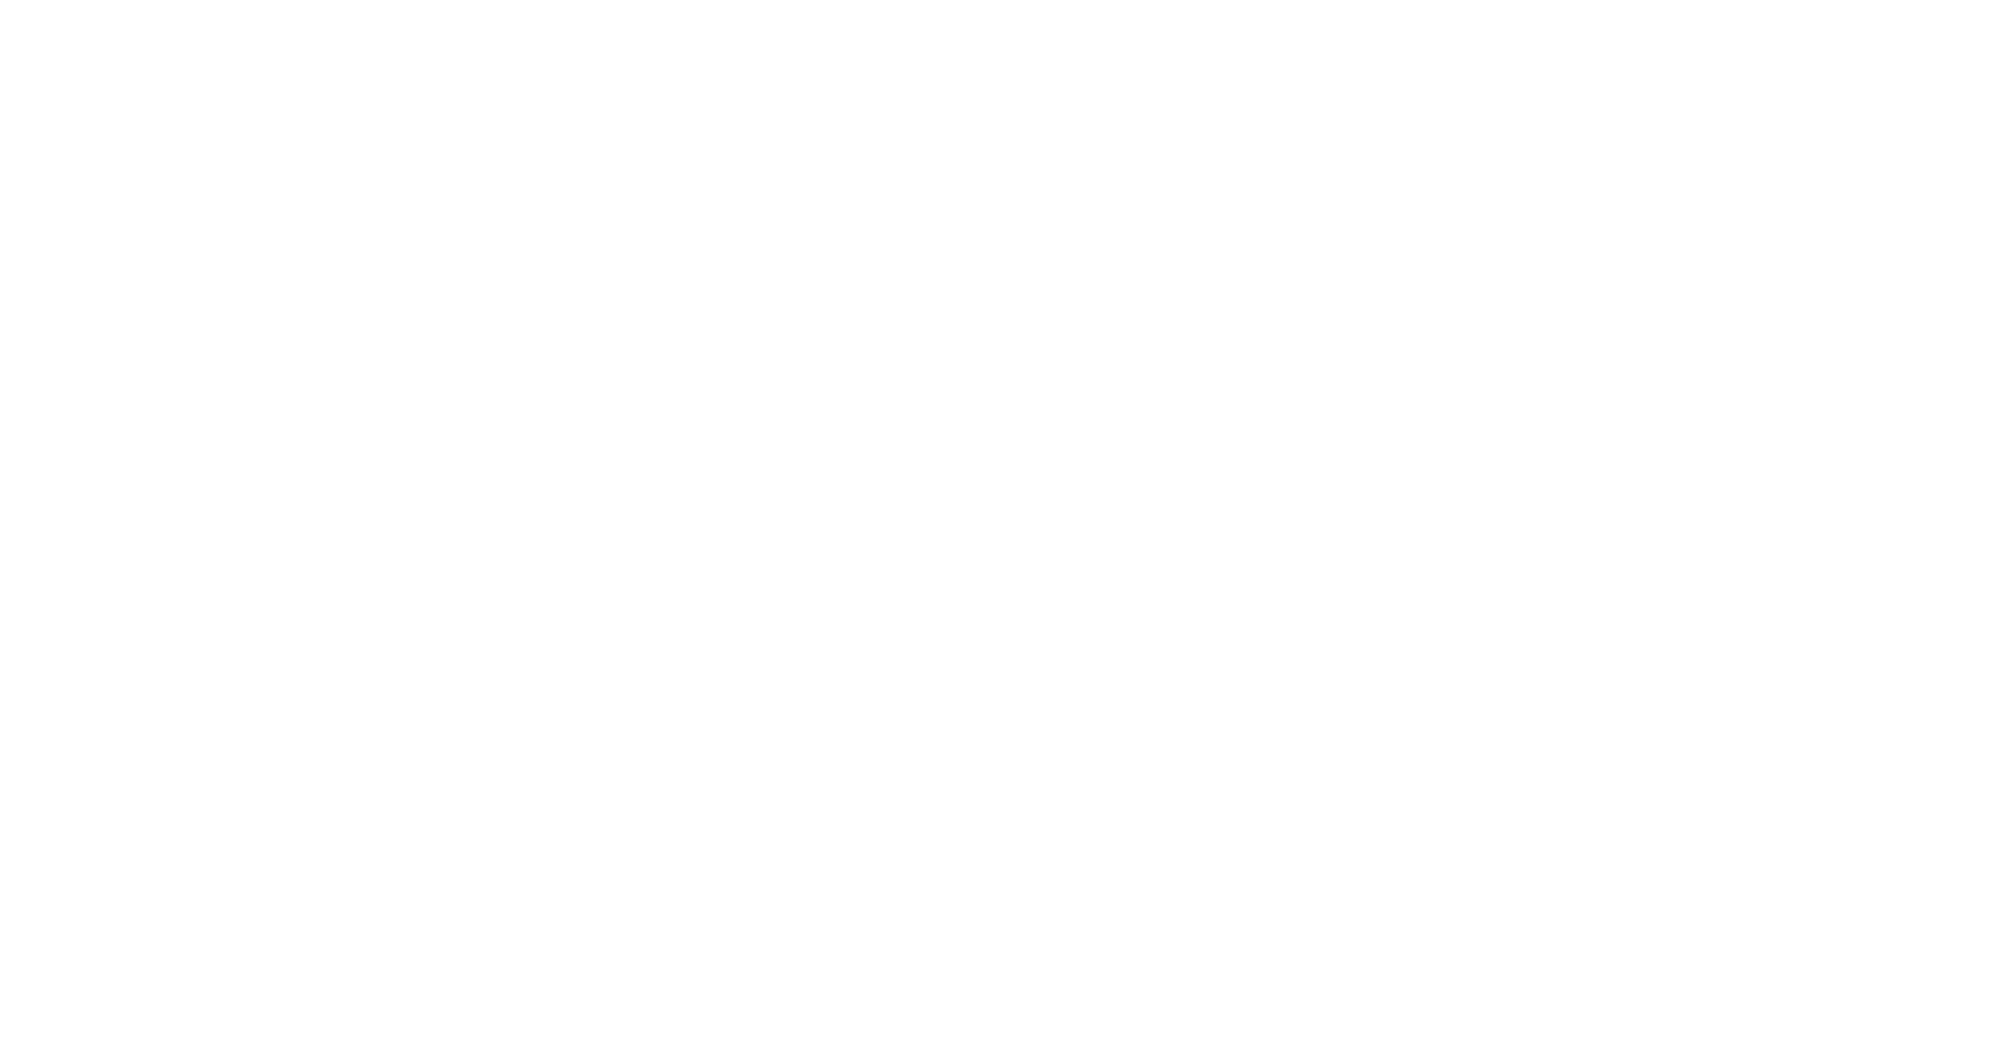 Cliente Megamedia